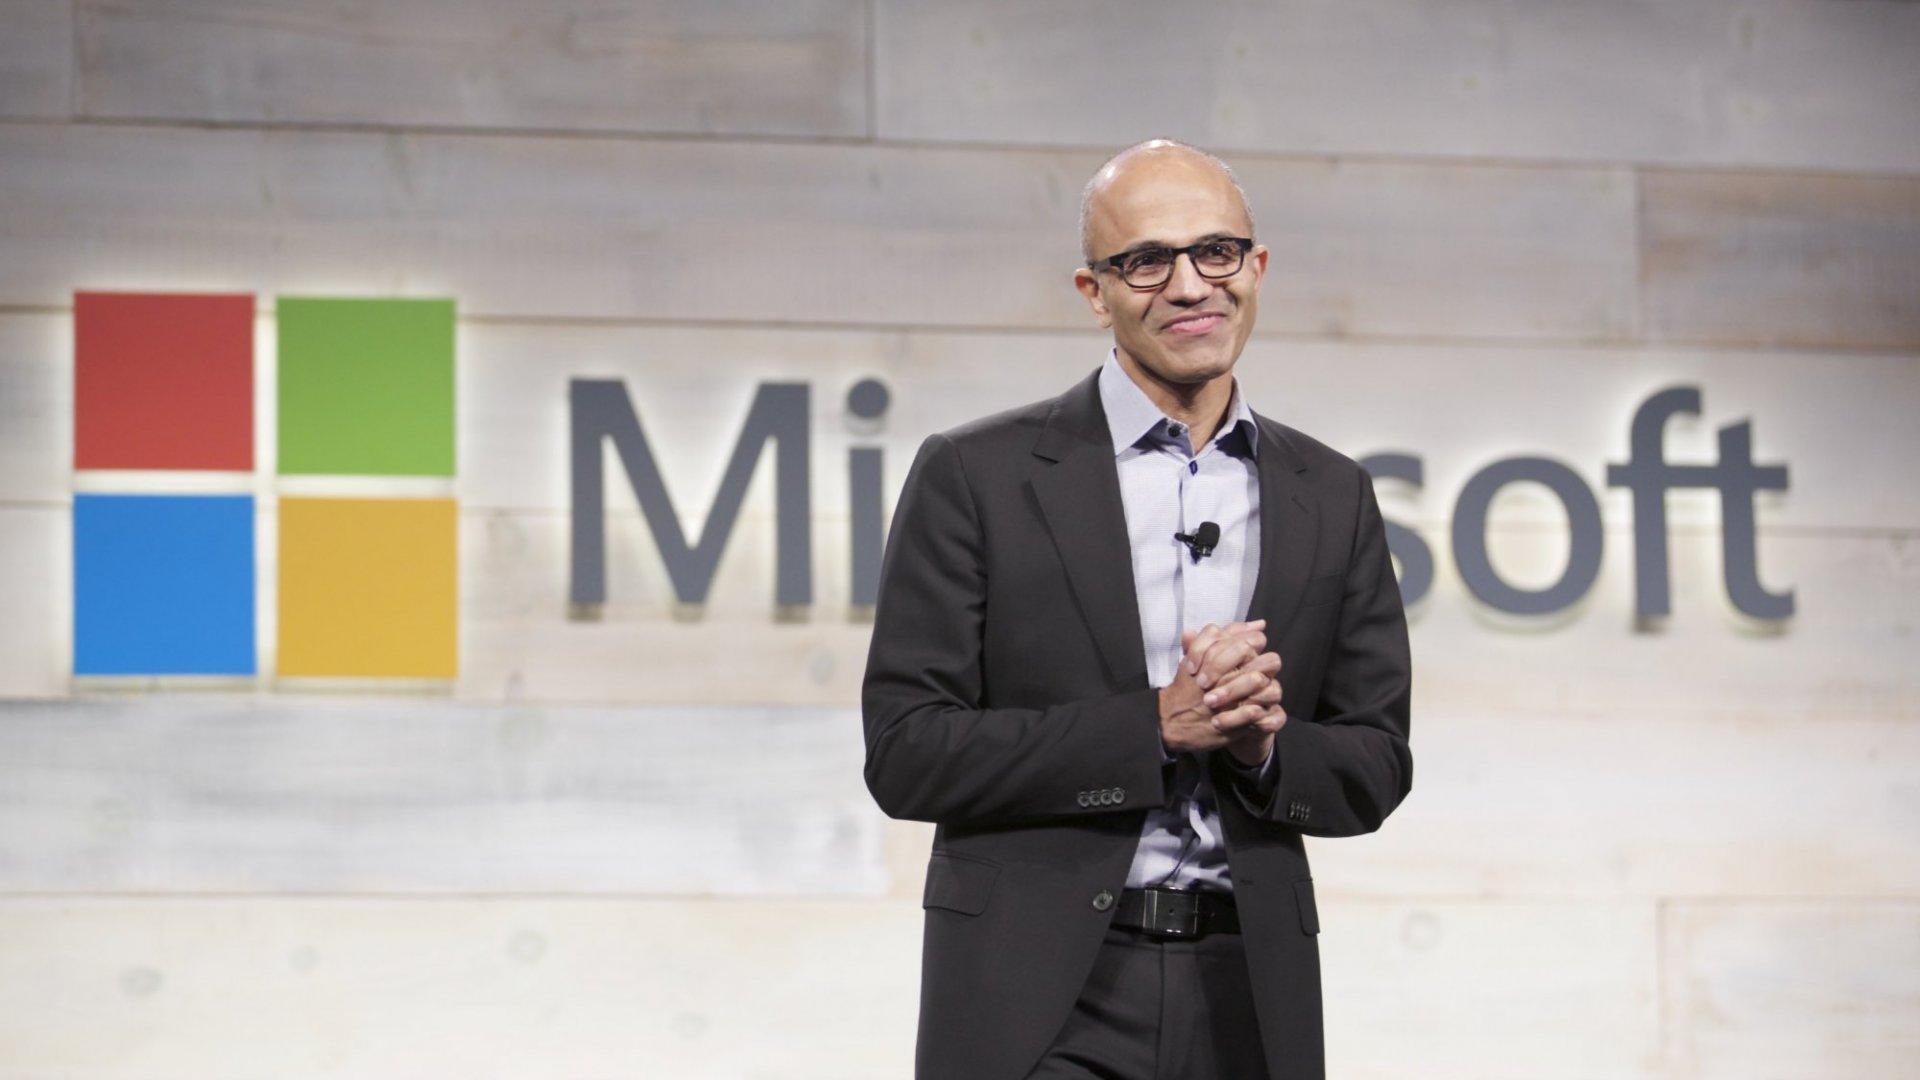 Why this Annoying Microsoft Windows 10 Nagging Problem Won't Go Away